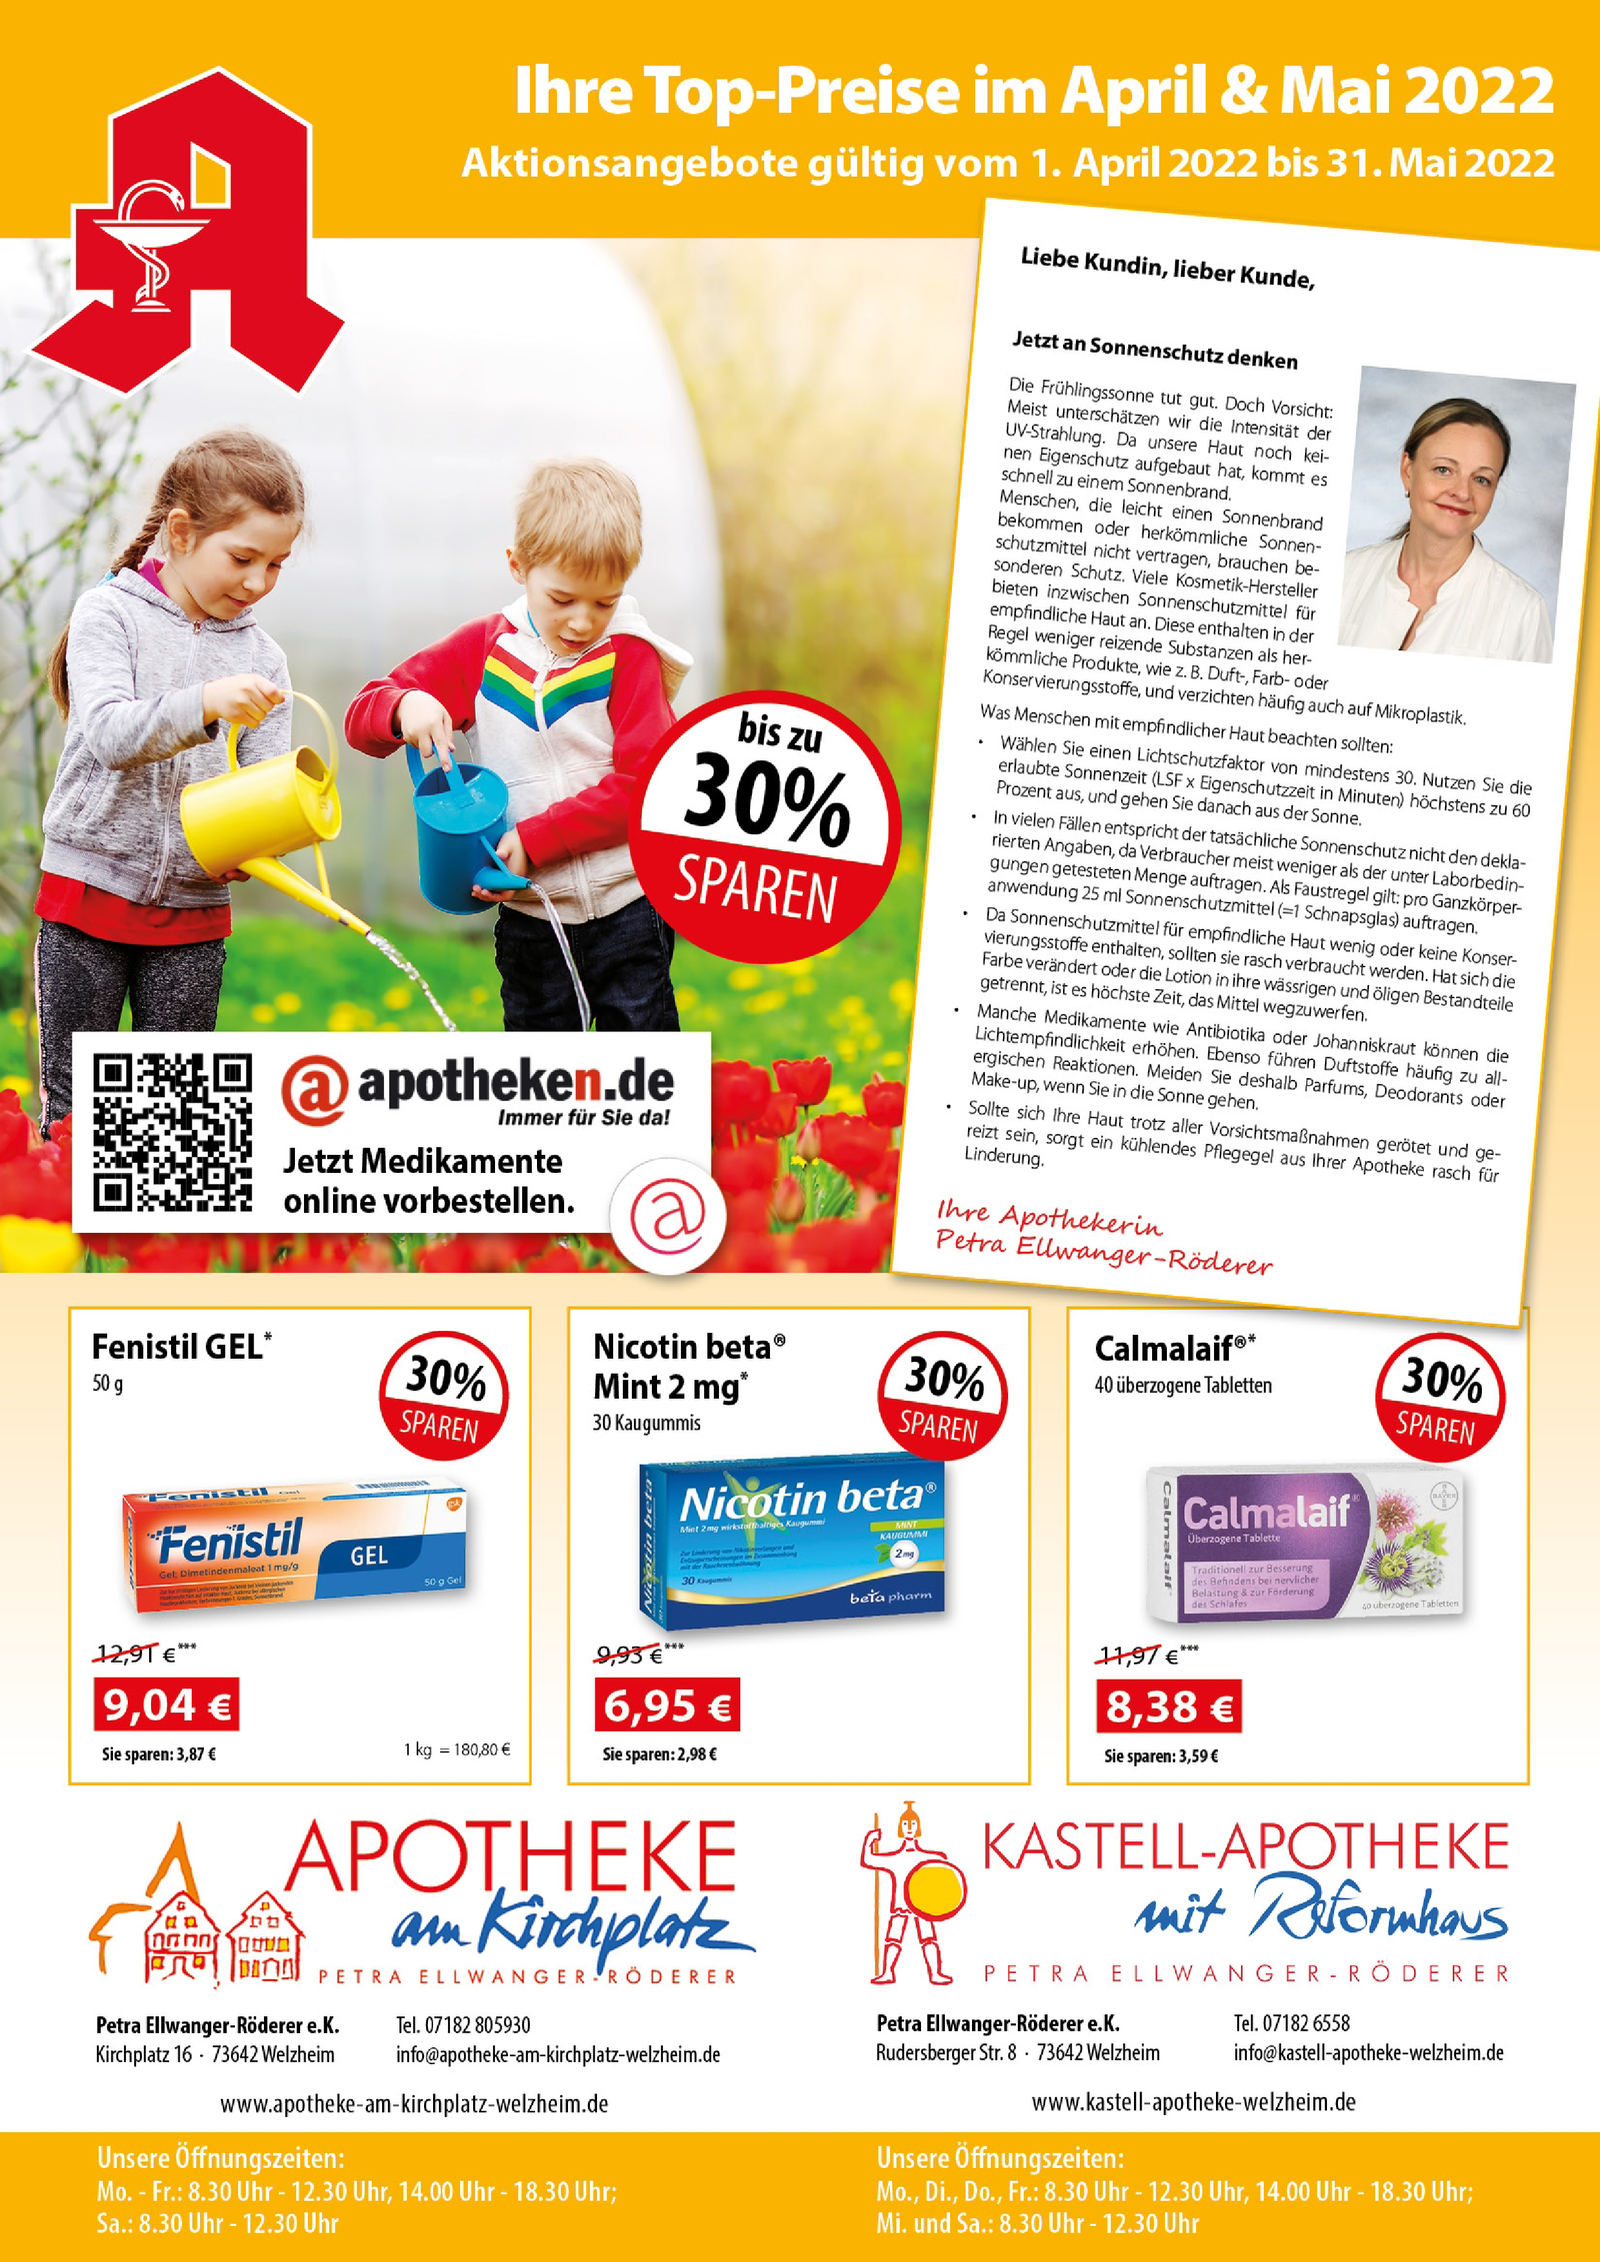 https://mein-uploads.apocdn.net/18642/leaflets/18642_flyer-Seite1.png